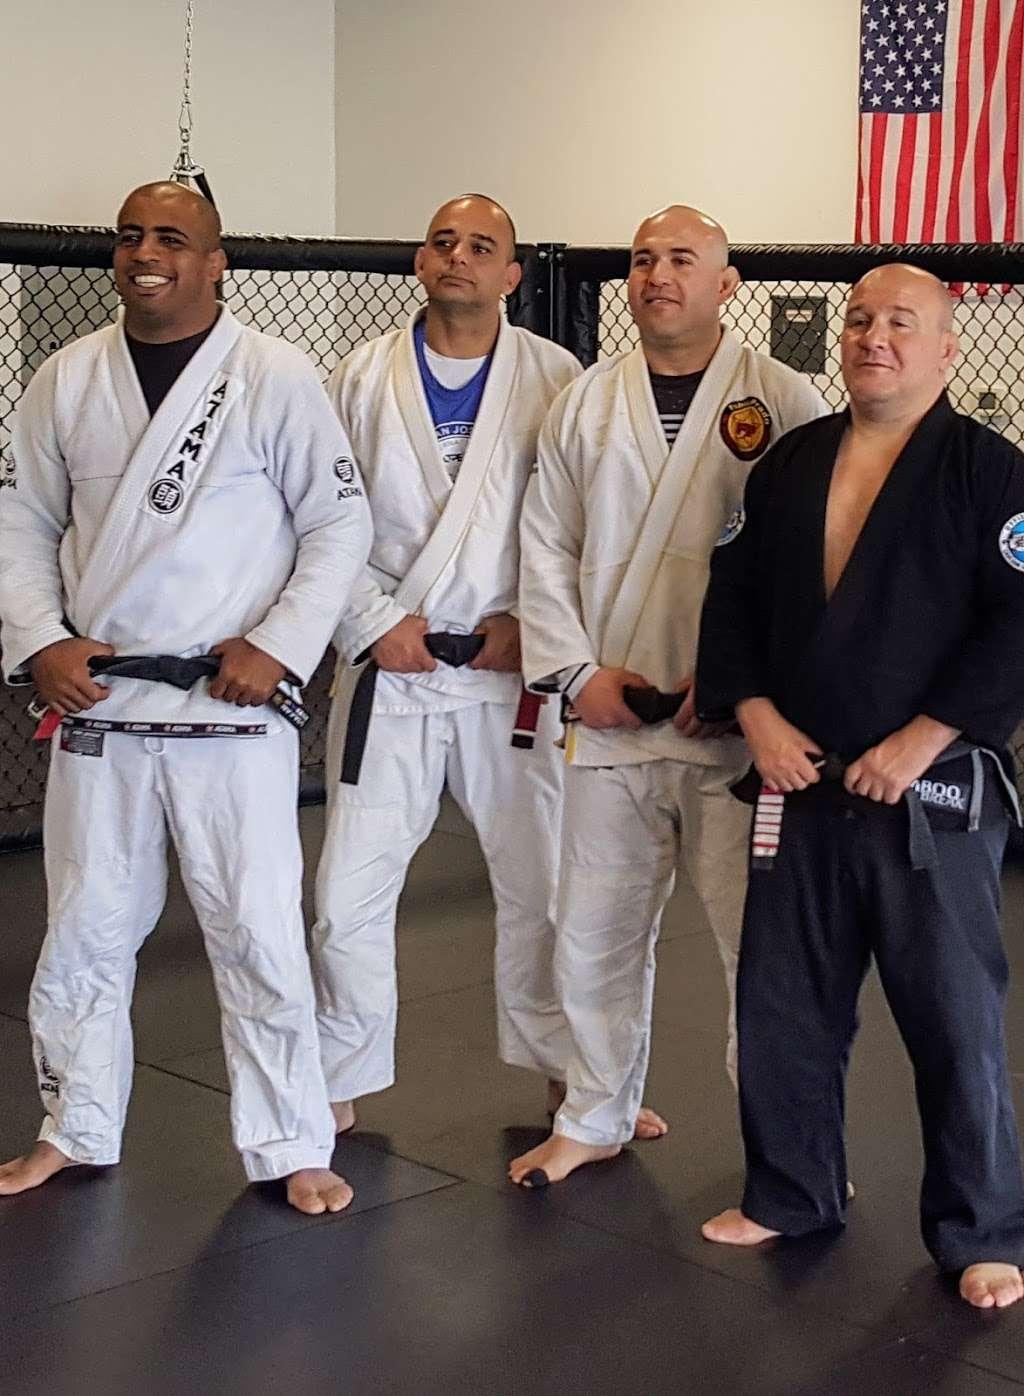 Fabio Prado Brazilian Jiu-Jitsu Academy - health  | Photo 6 of 9 | Address: 2600 Plaza Ct, Dixon, CA 95620, USA | Phone: (707) 564-9711